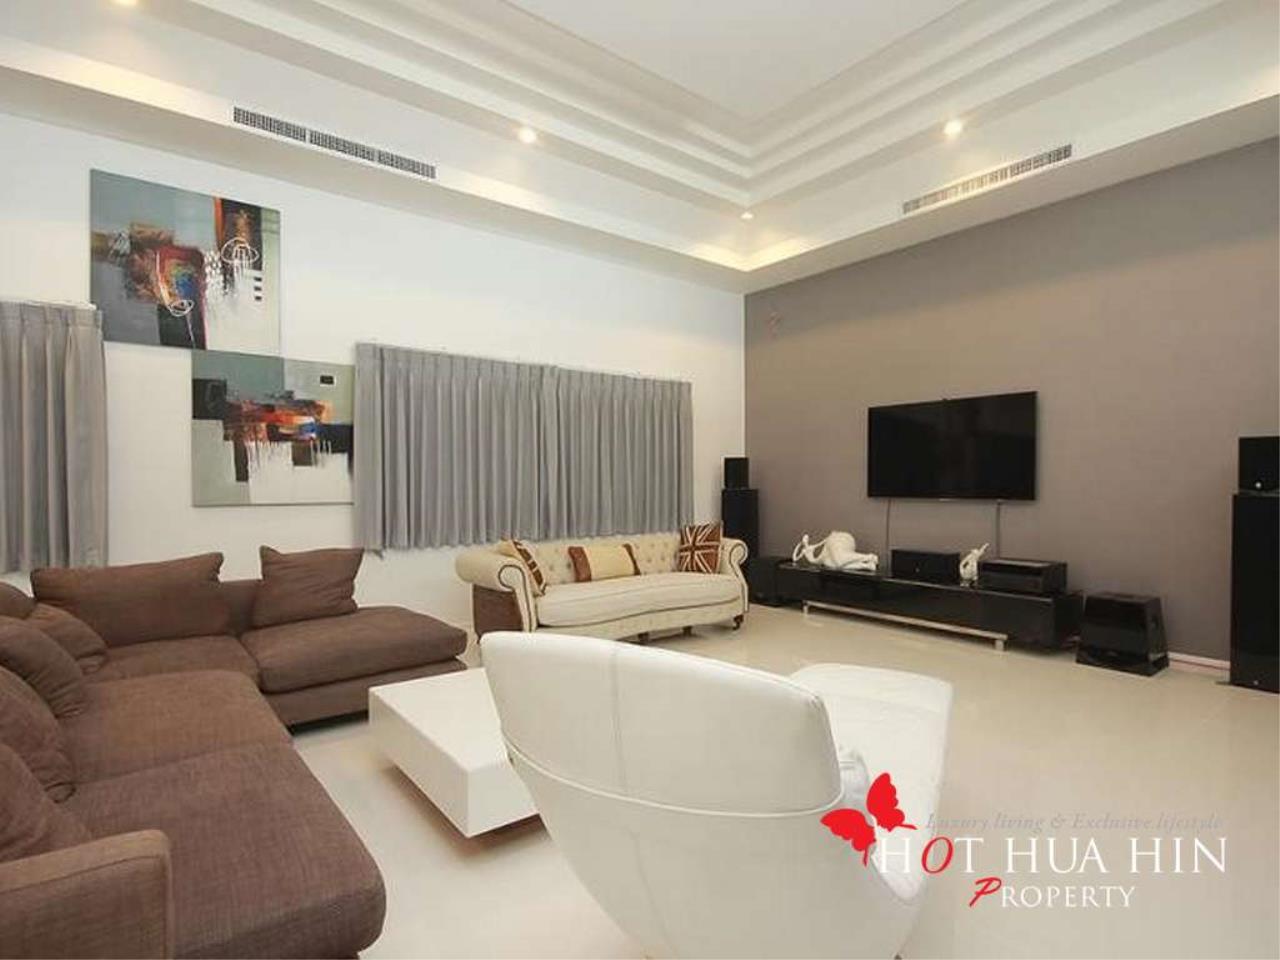 Hot Hua Hin Co. Ltd. Agency's New Luxury Smart Home In Popular Area 9